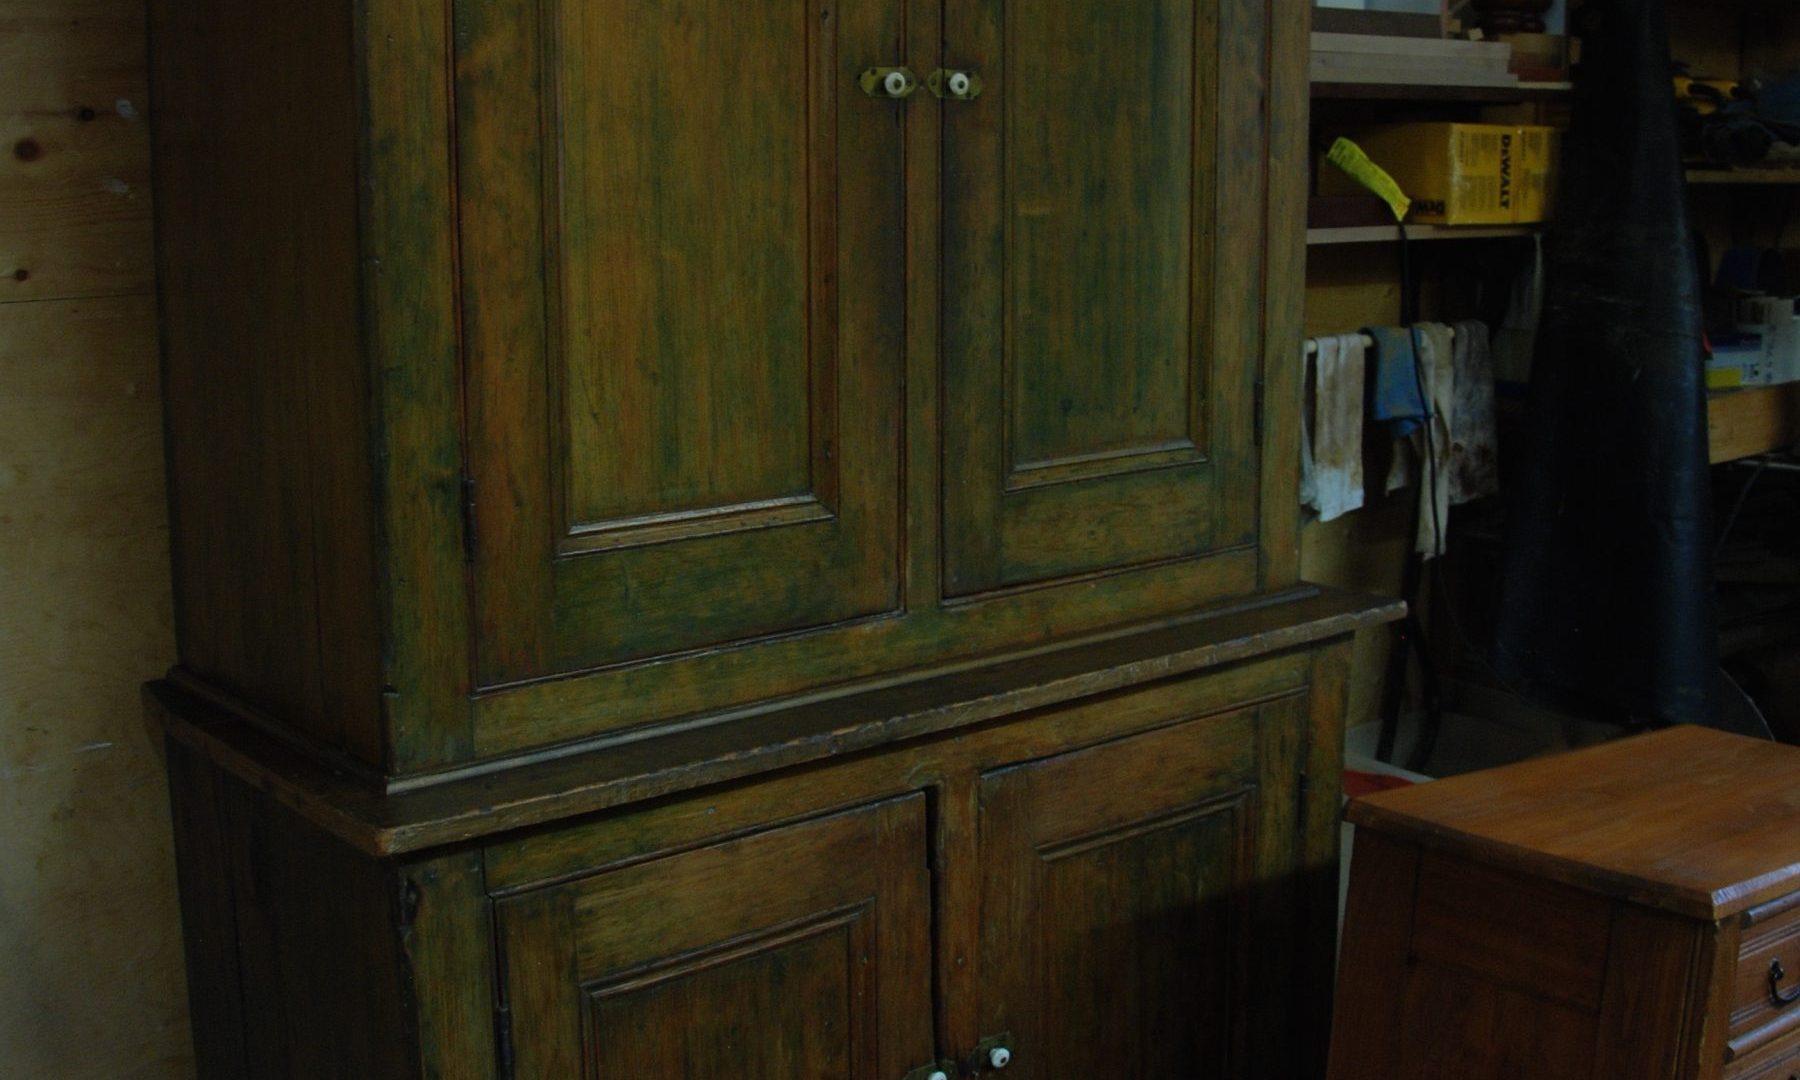 armoire fini ciré